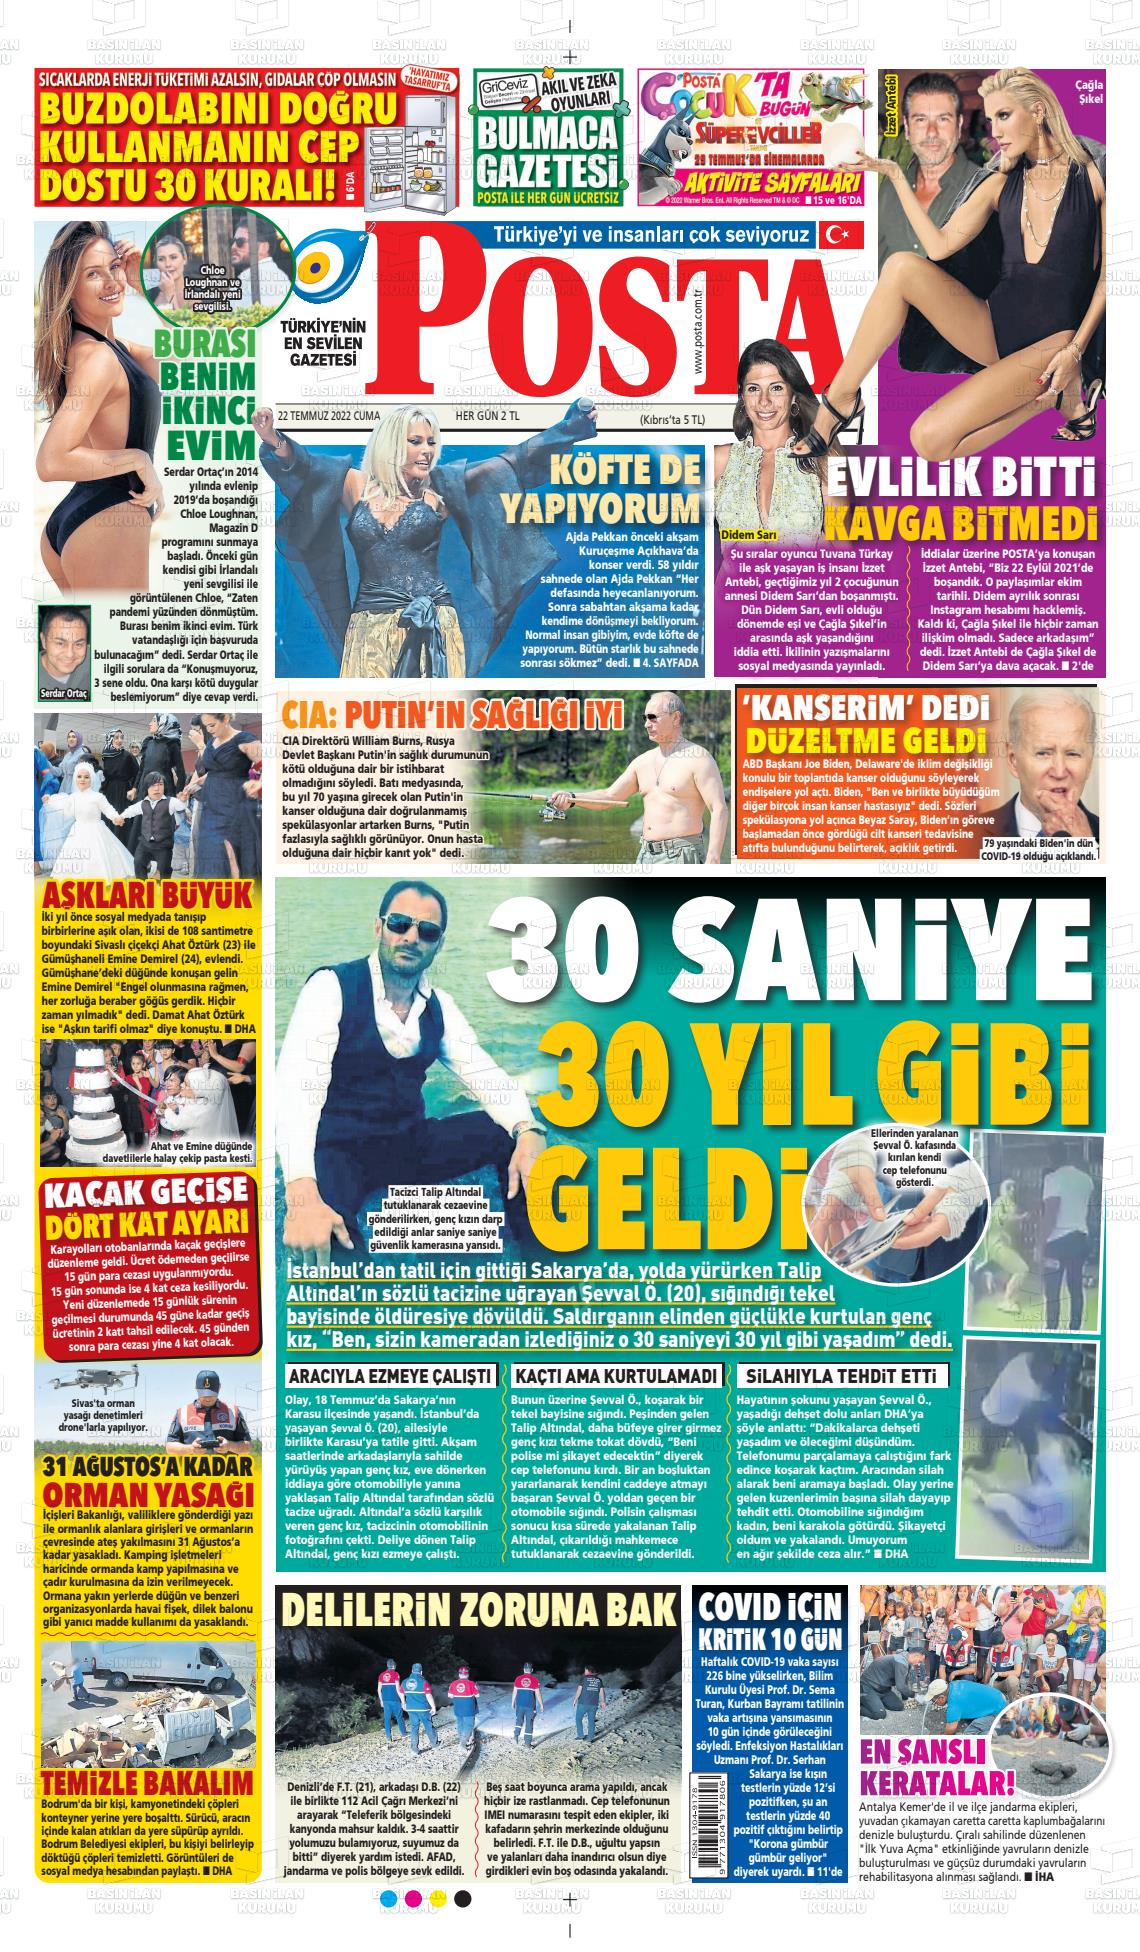 23 Ağustos 2019, Cuma posta Gazetesi